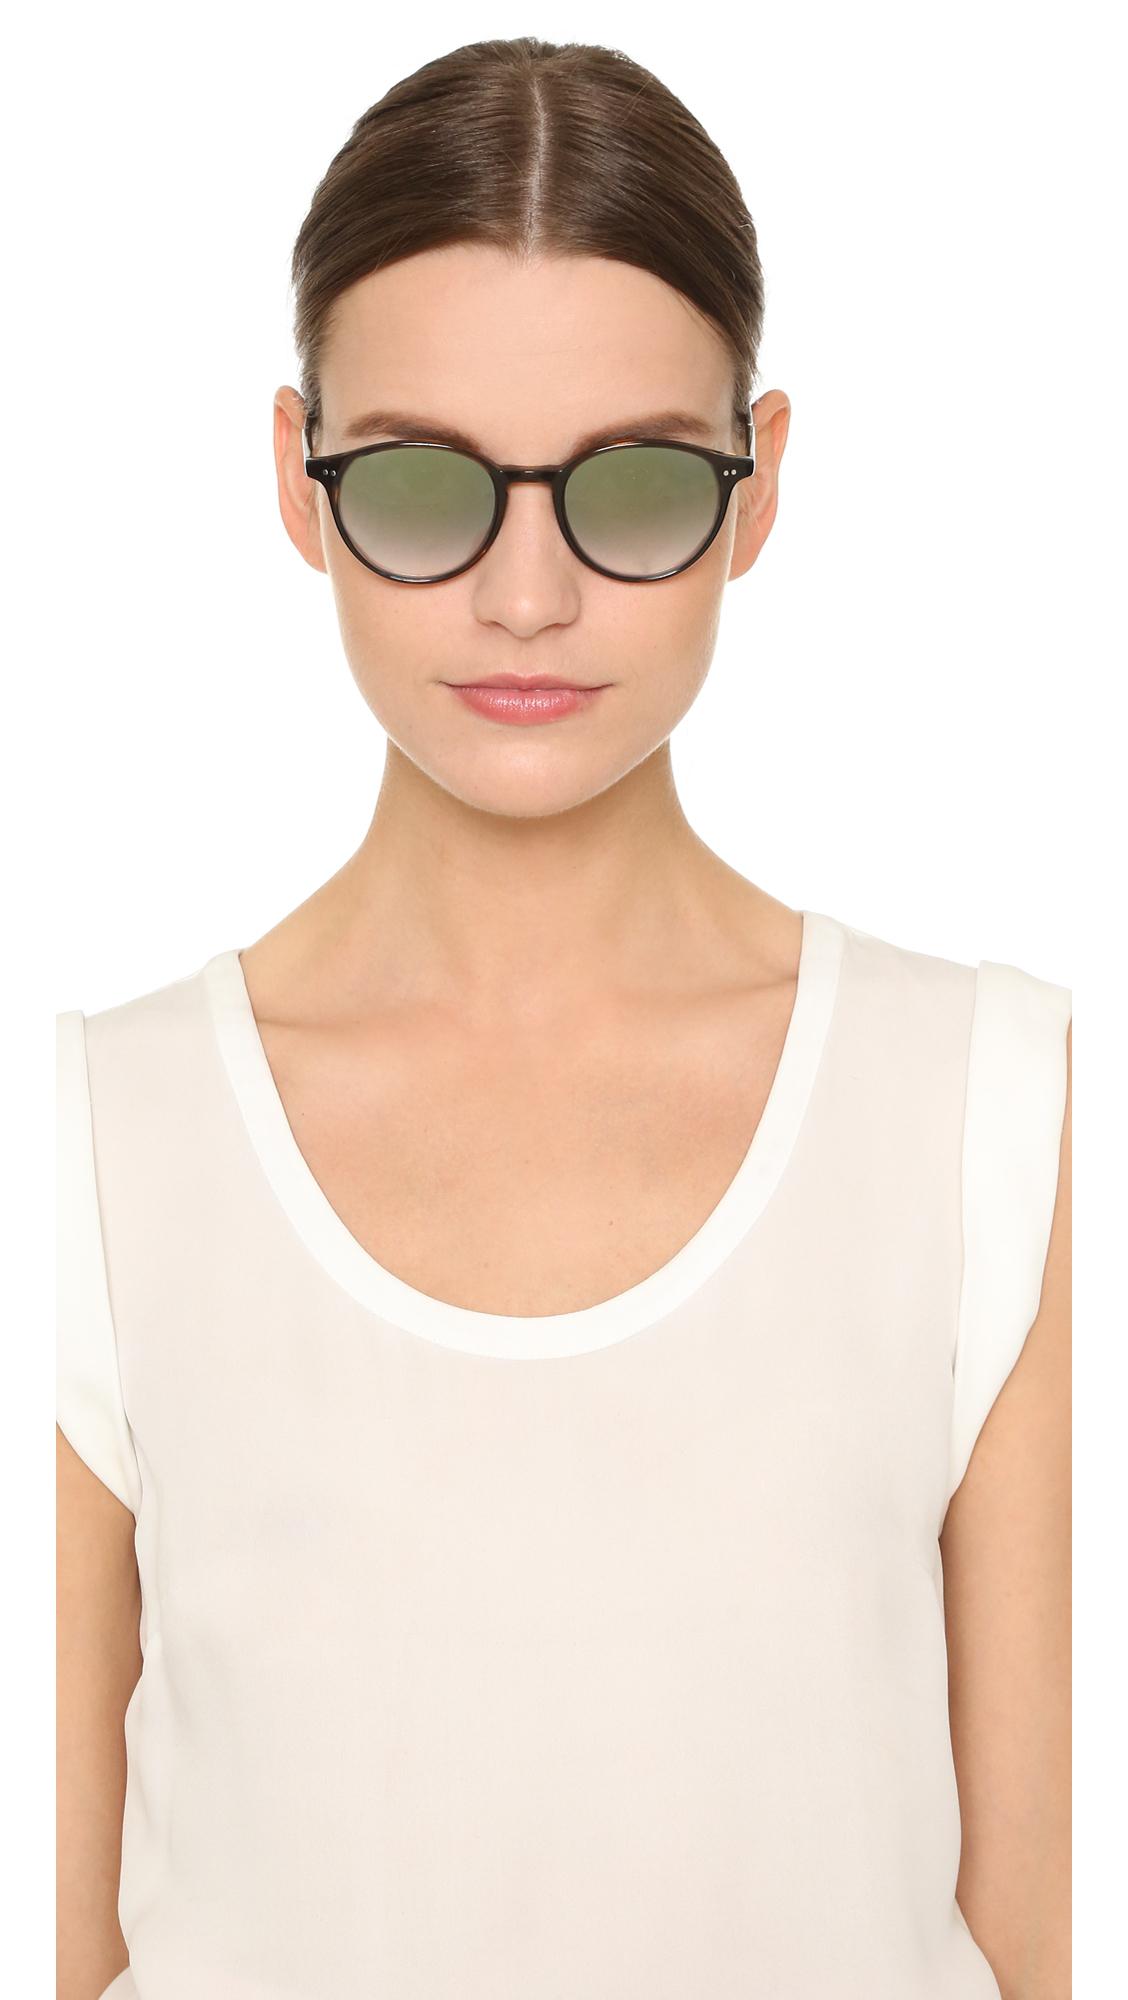 de gafas sol 'pacifico' Leight Garrett FqYHZznwn